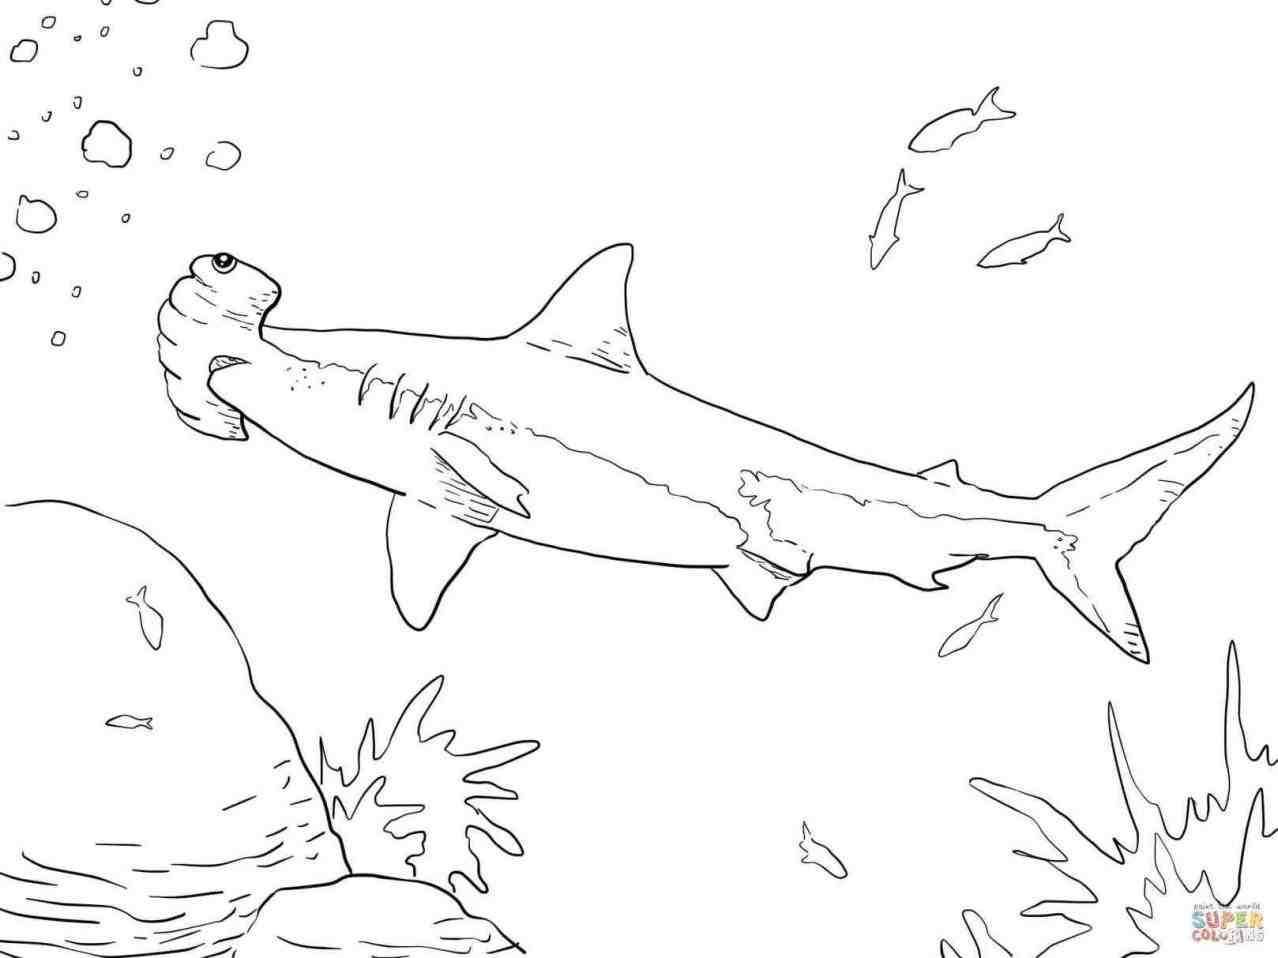 1278x958 Draw Hammerhead Shark. Hammerhead Shark Cartoon Illustration Stock